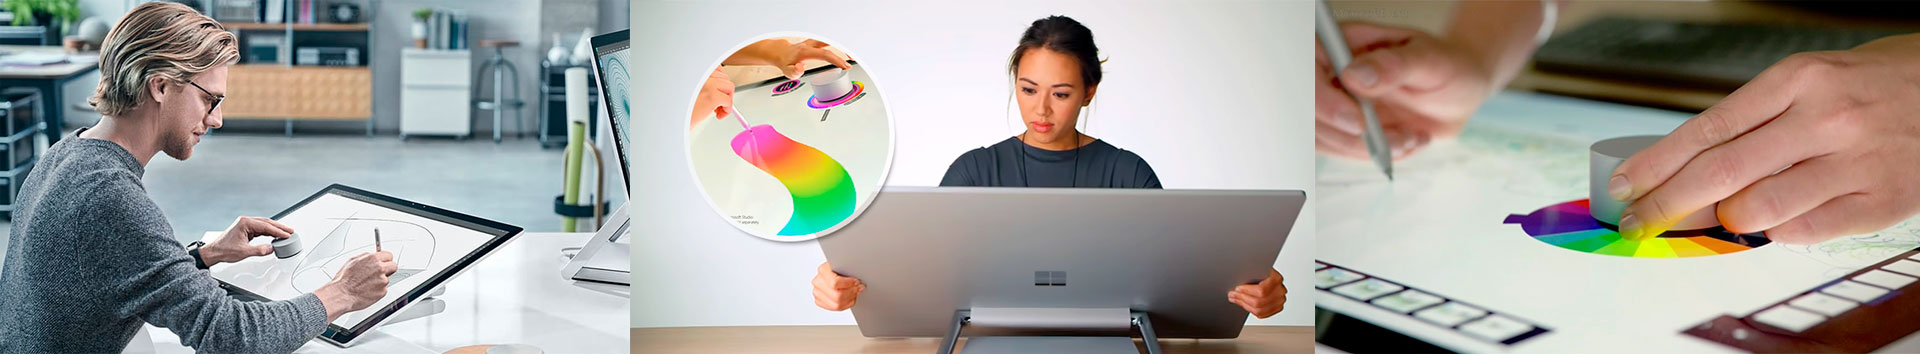 Surface Studio view8